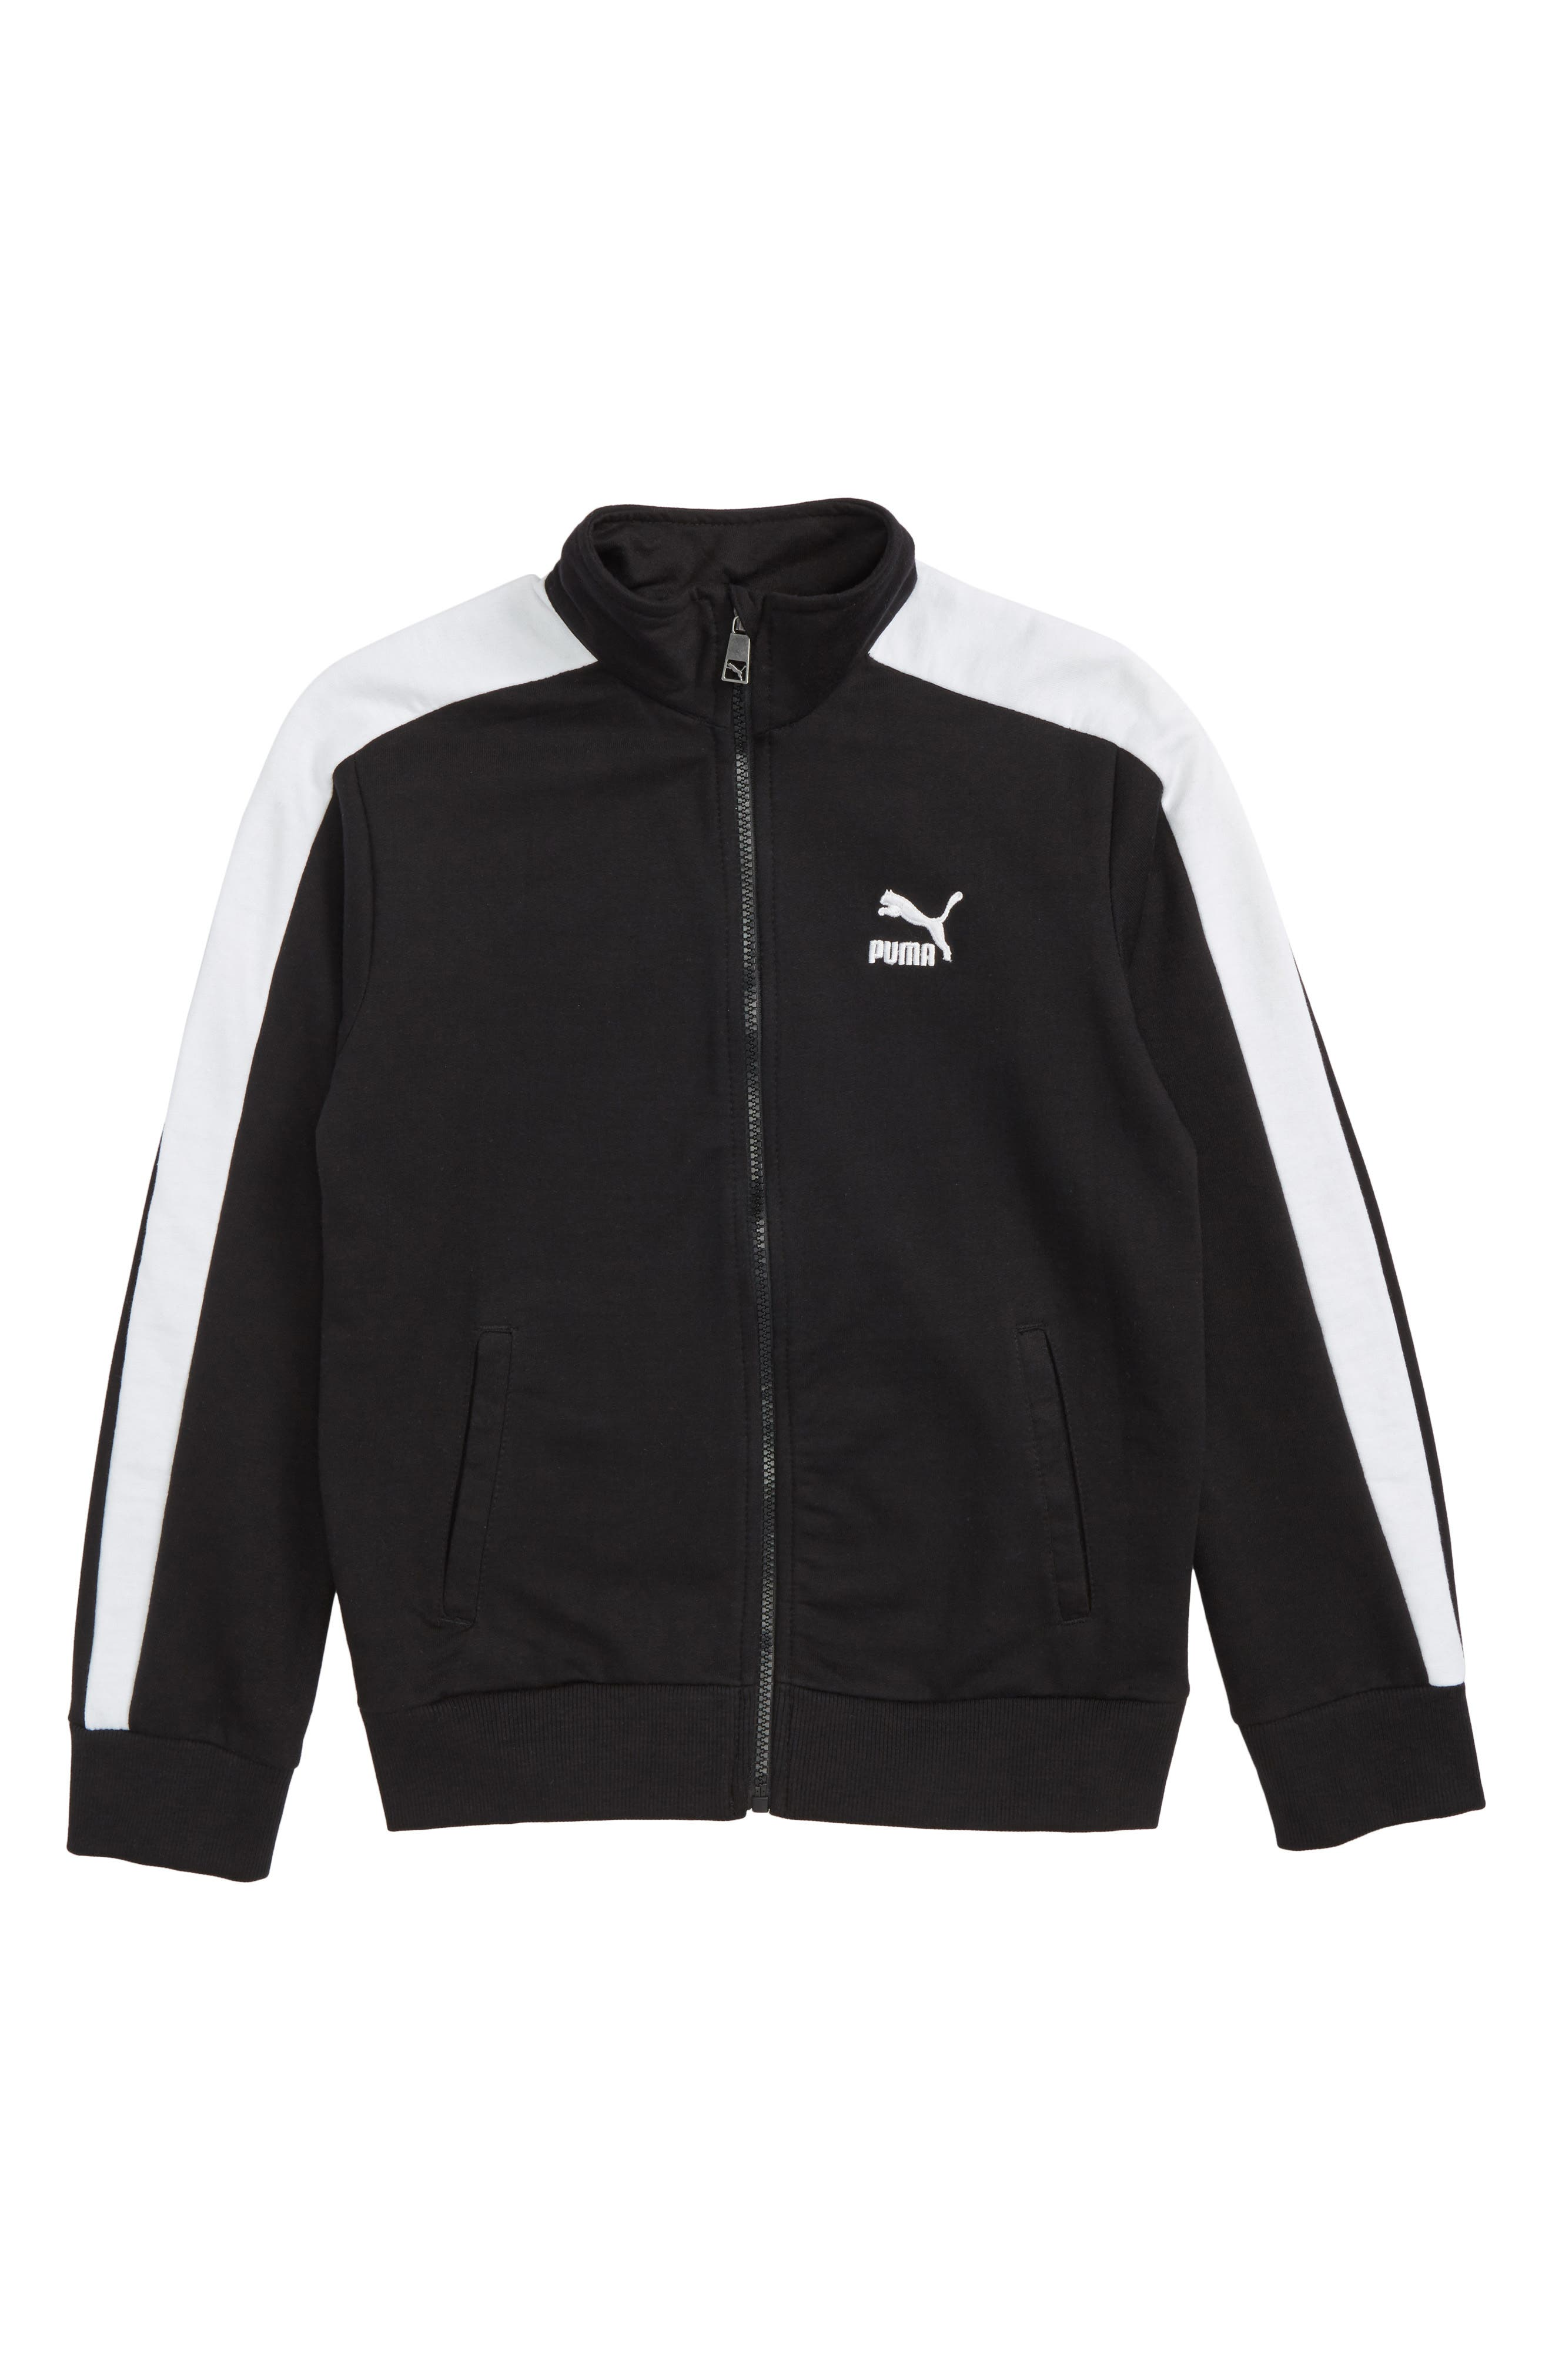 T7 Track Jacket,                         Main,                         color, Puma Black